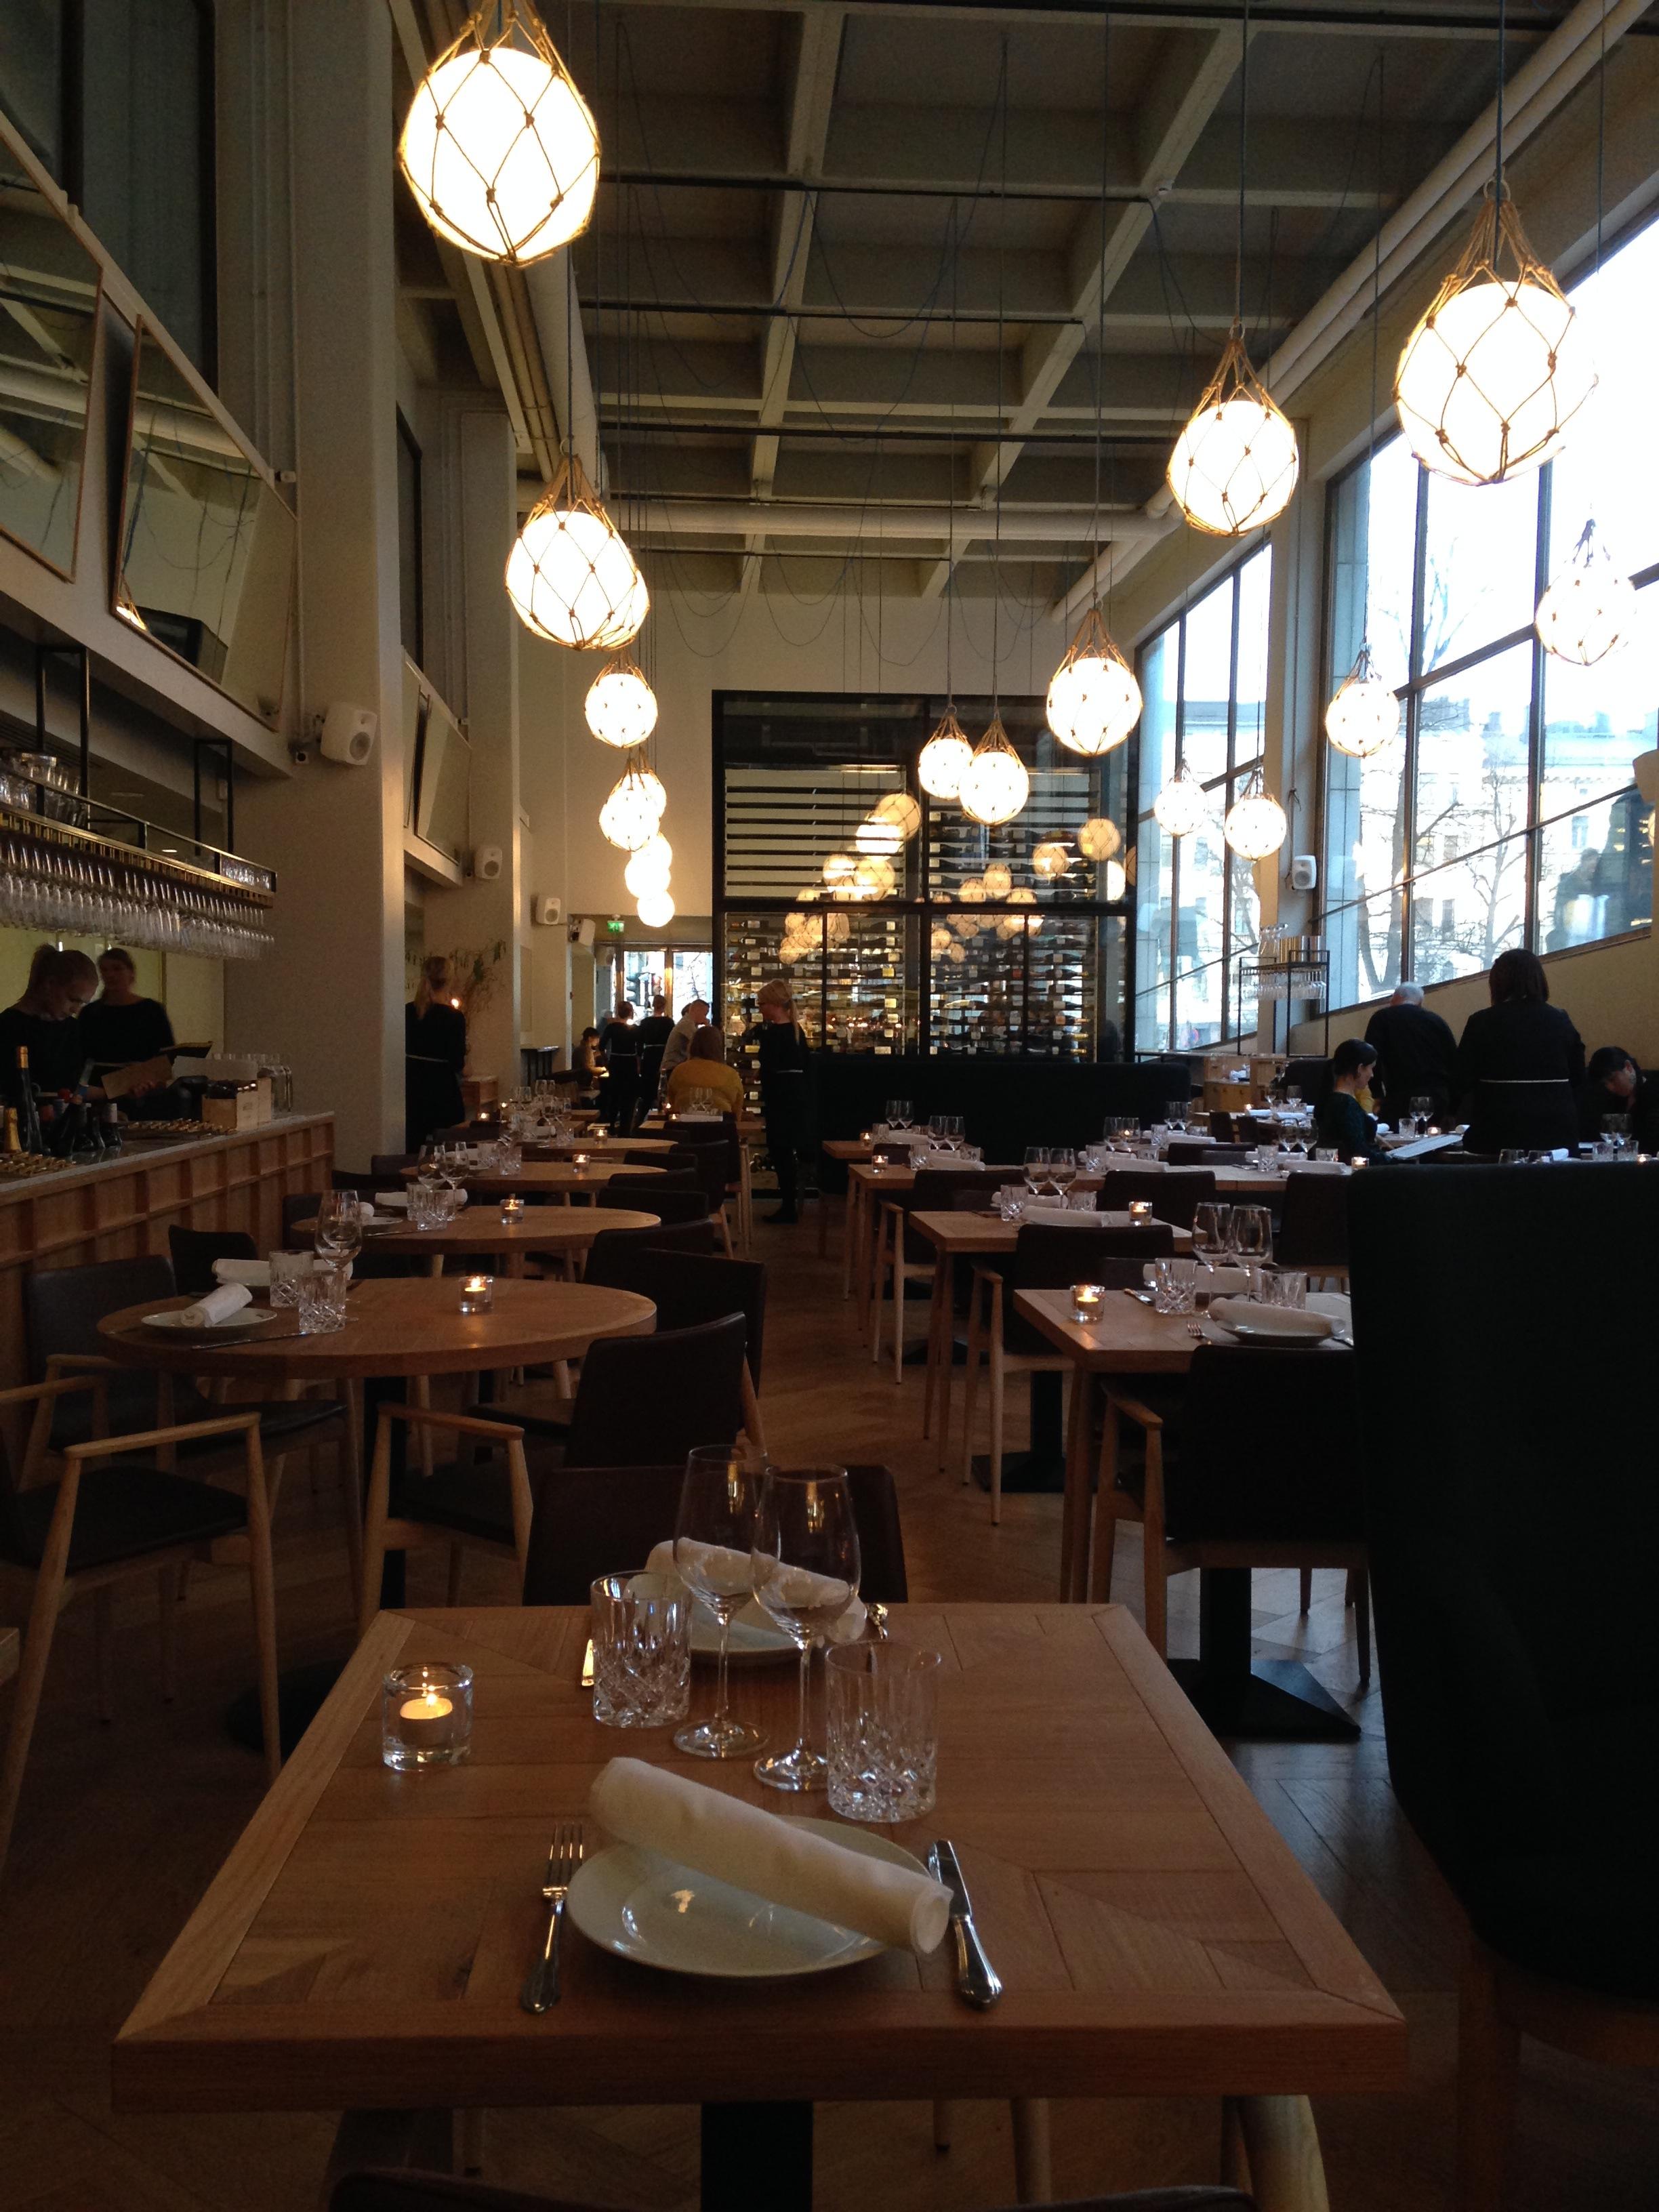 Ravintola Bronda, Helsingfors